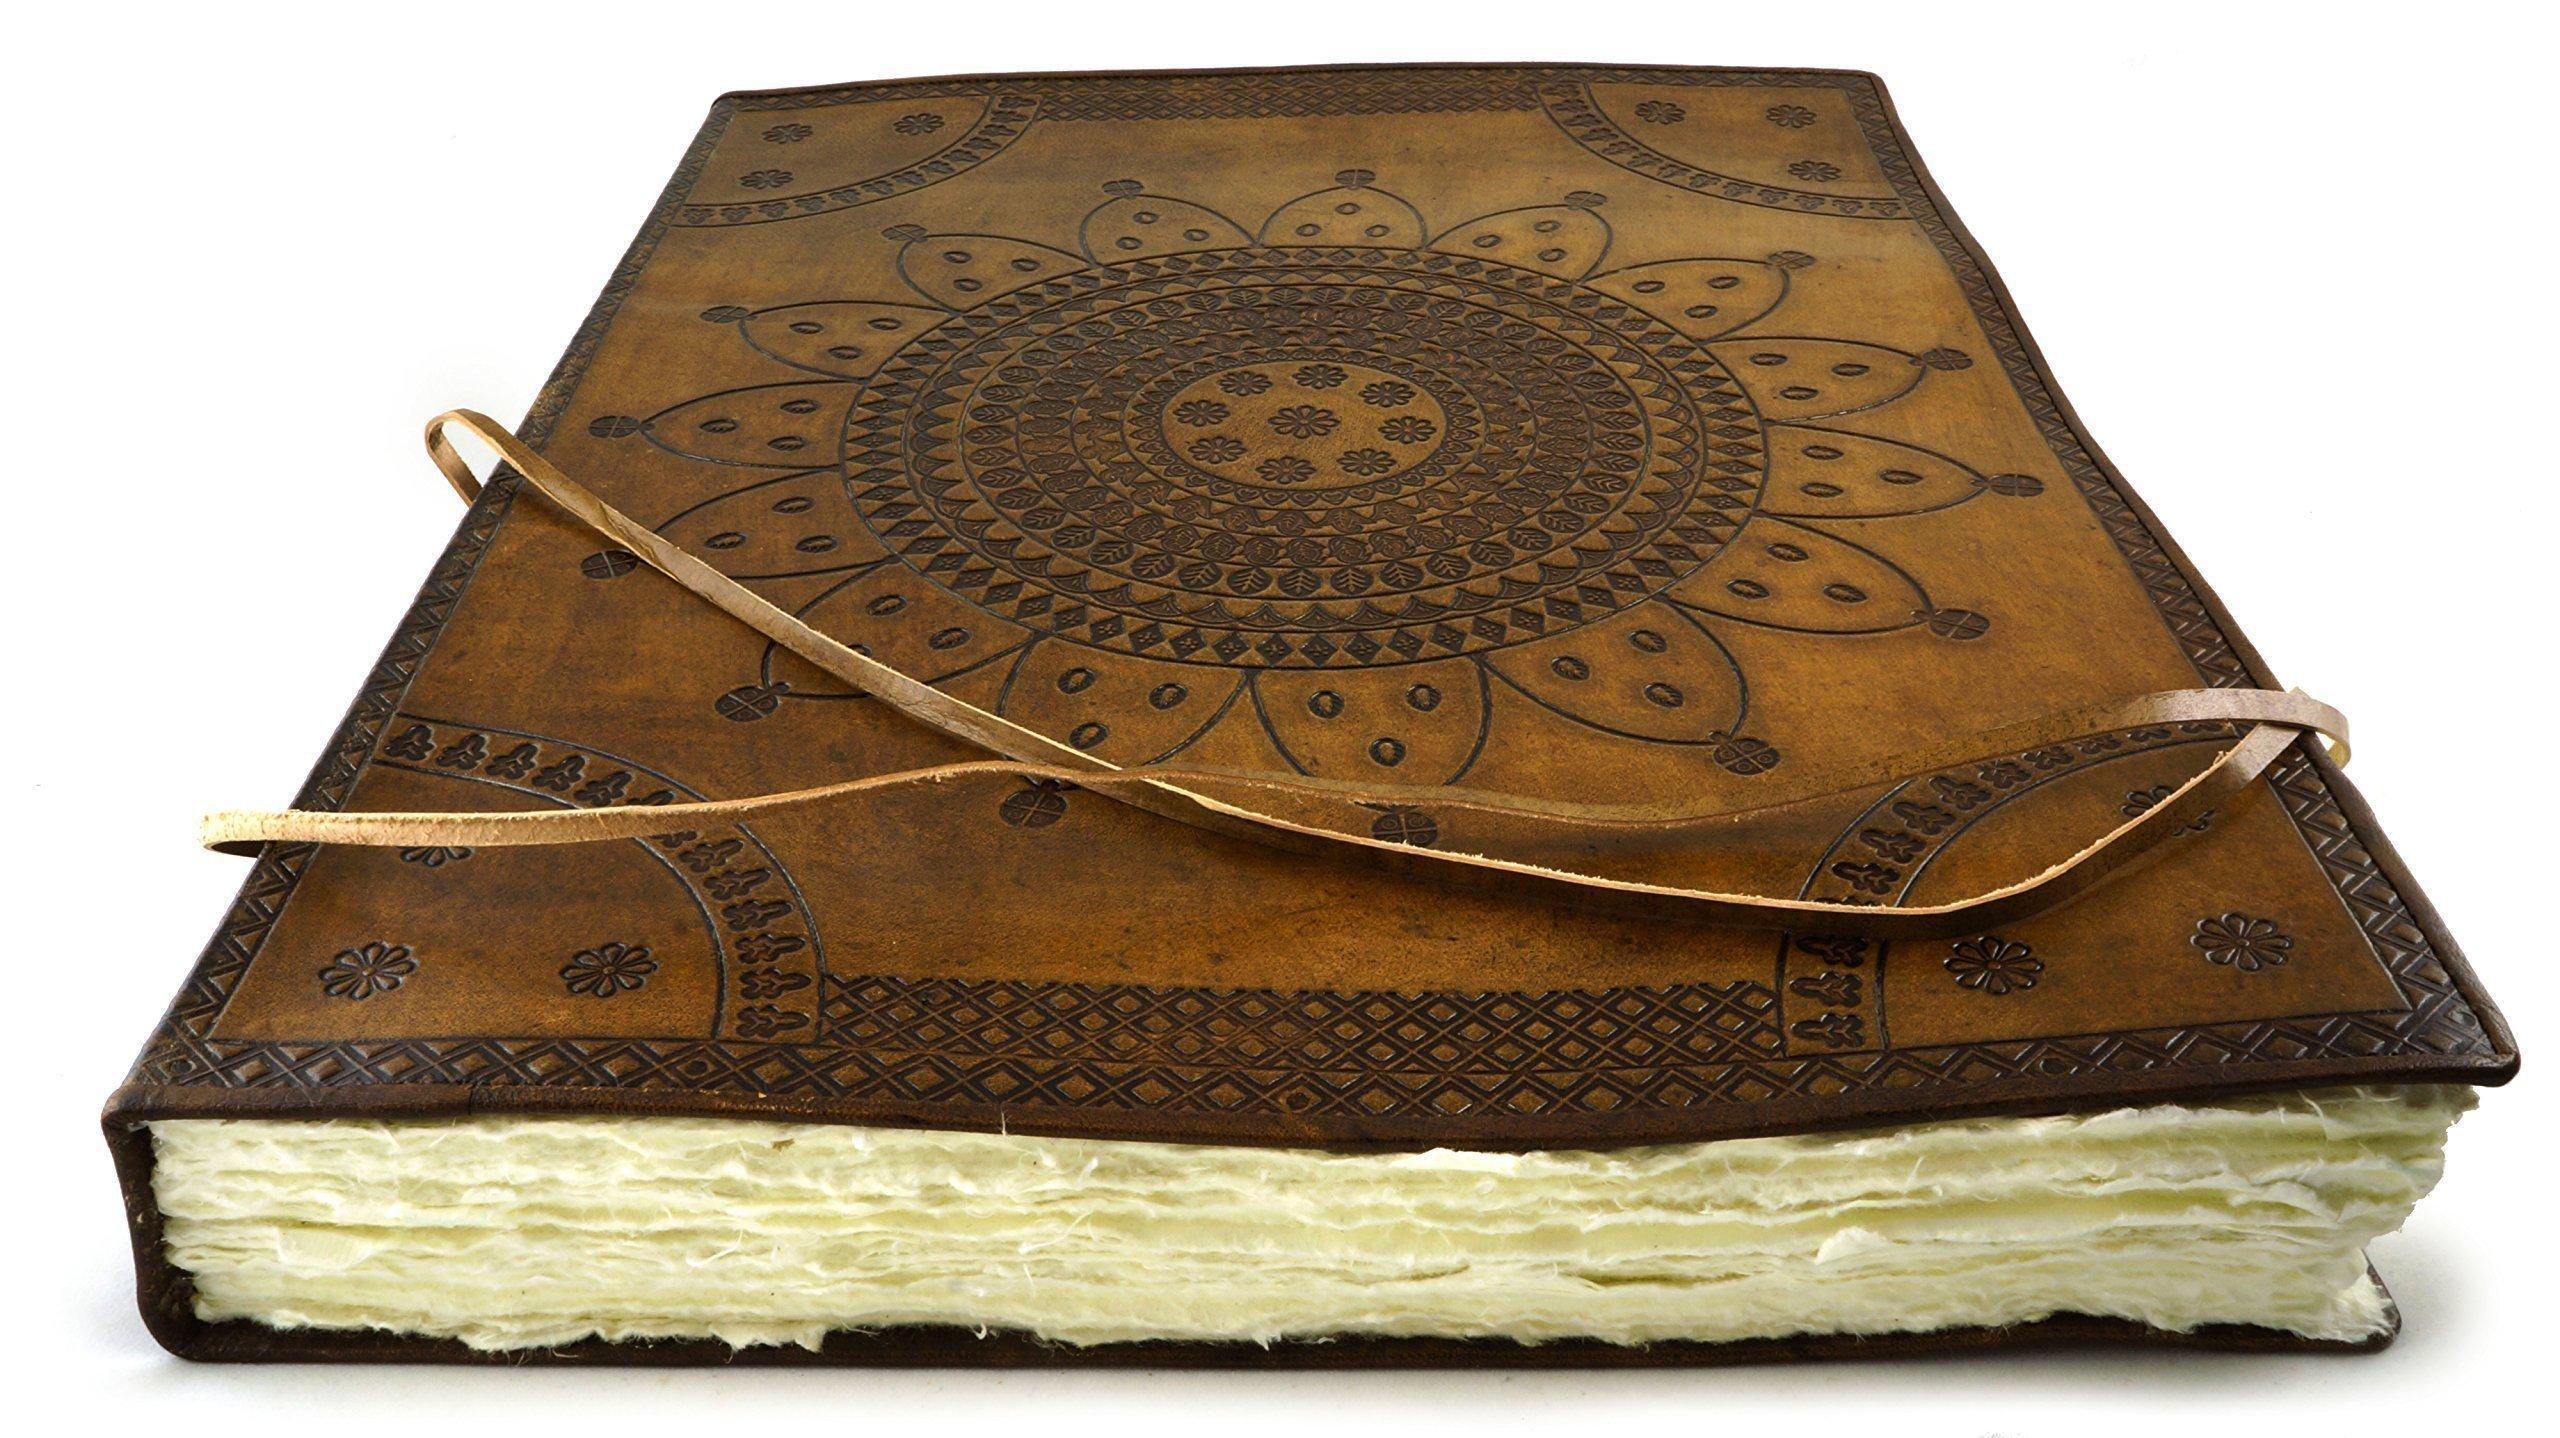 Largest Handmade Leather Artist Sketchbook Journal 18'' x 14'' Hand Torn Deckle Paper 200 Sheet by Terra Negra Studio